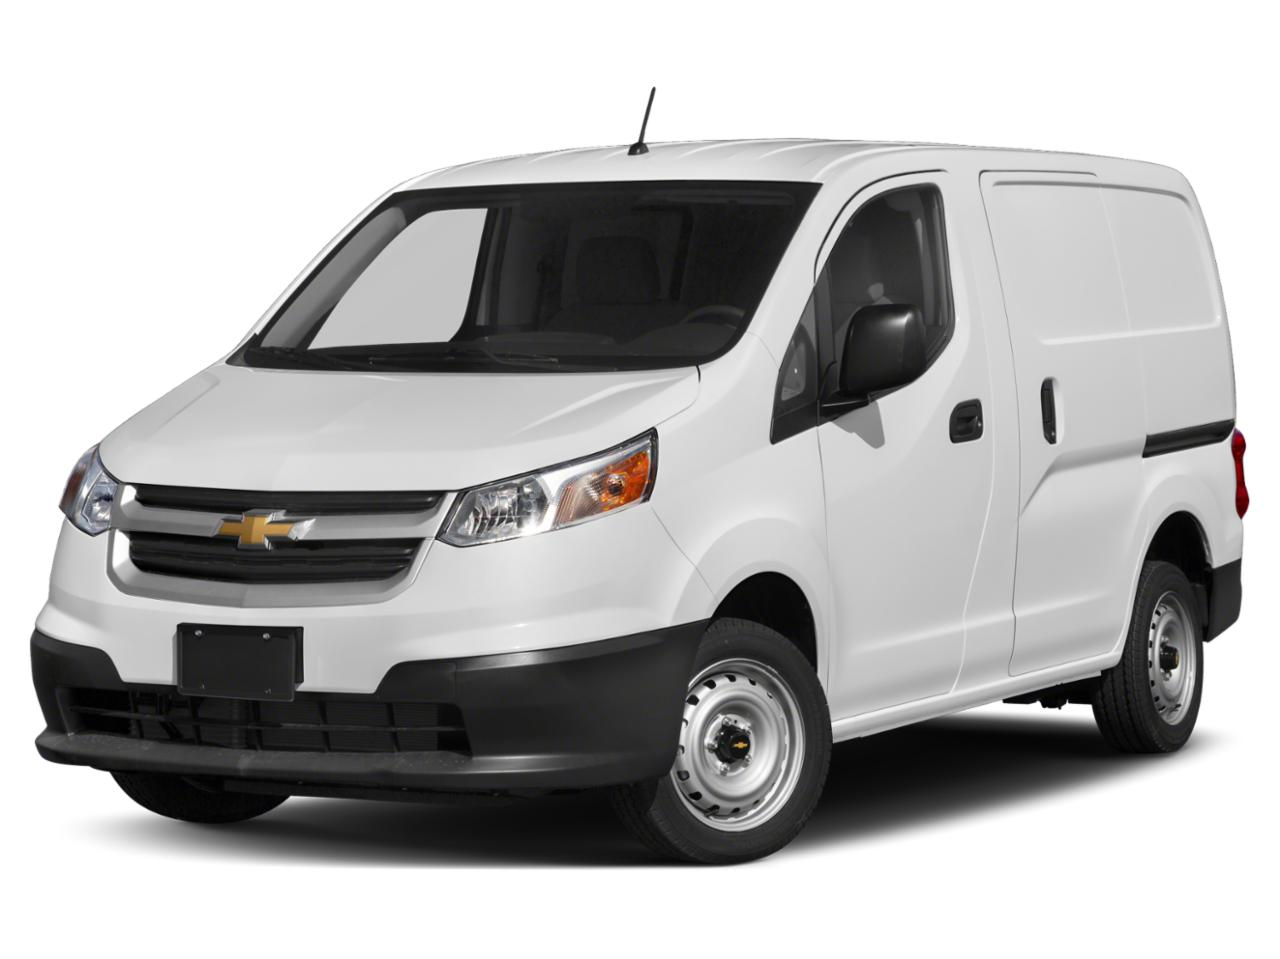 2018 Chevrolet City Express Cargo Van Vehicle Photo in Clifton, NJ 07013